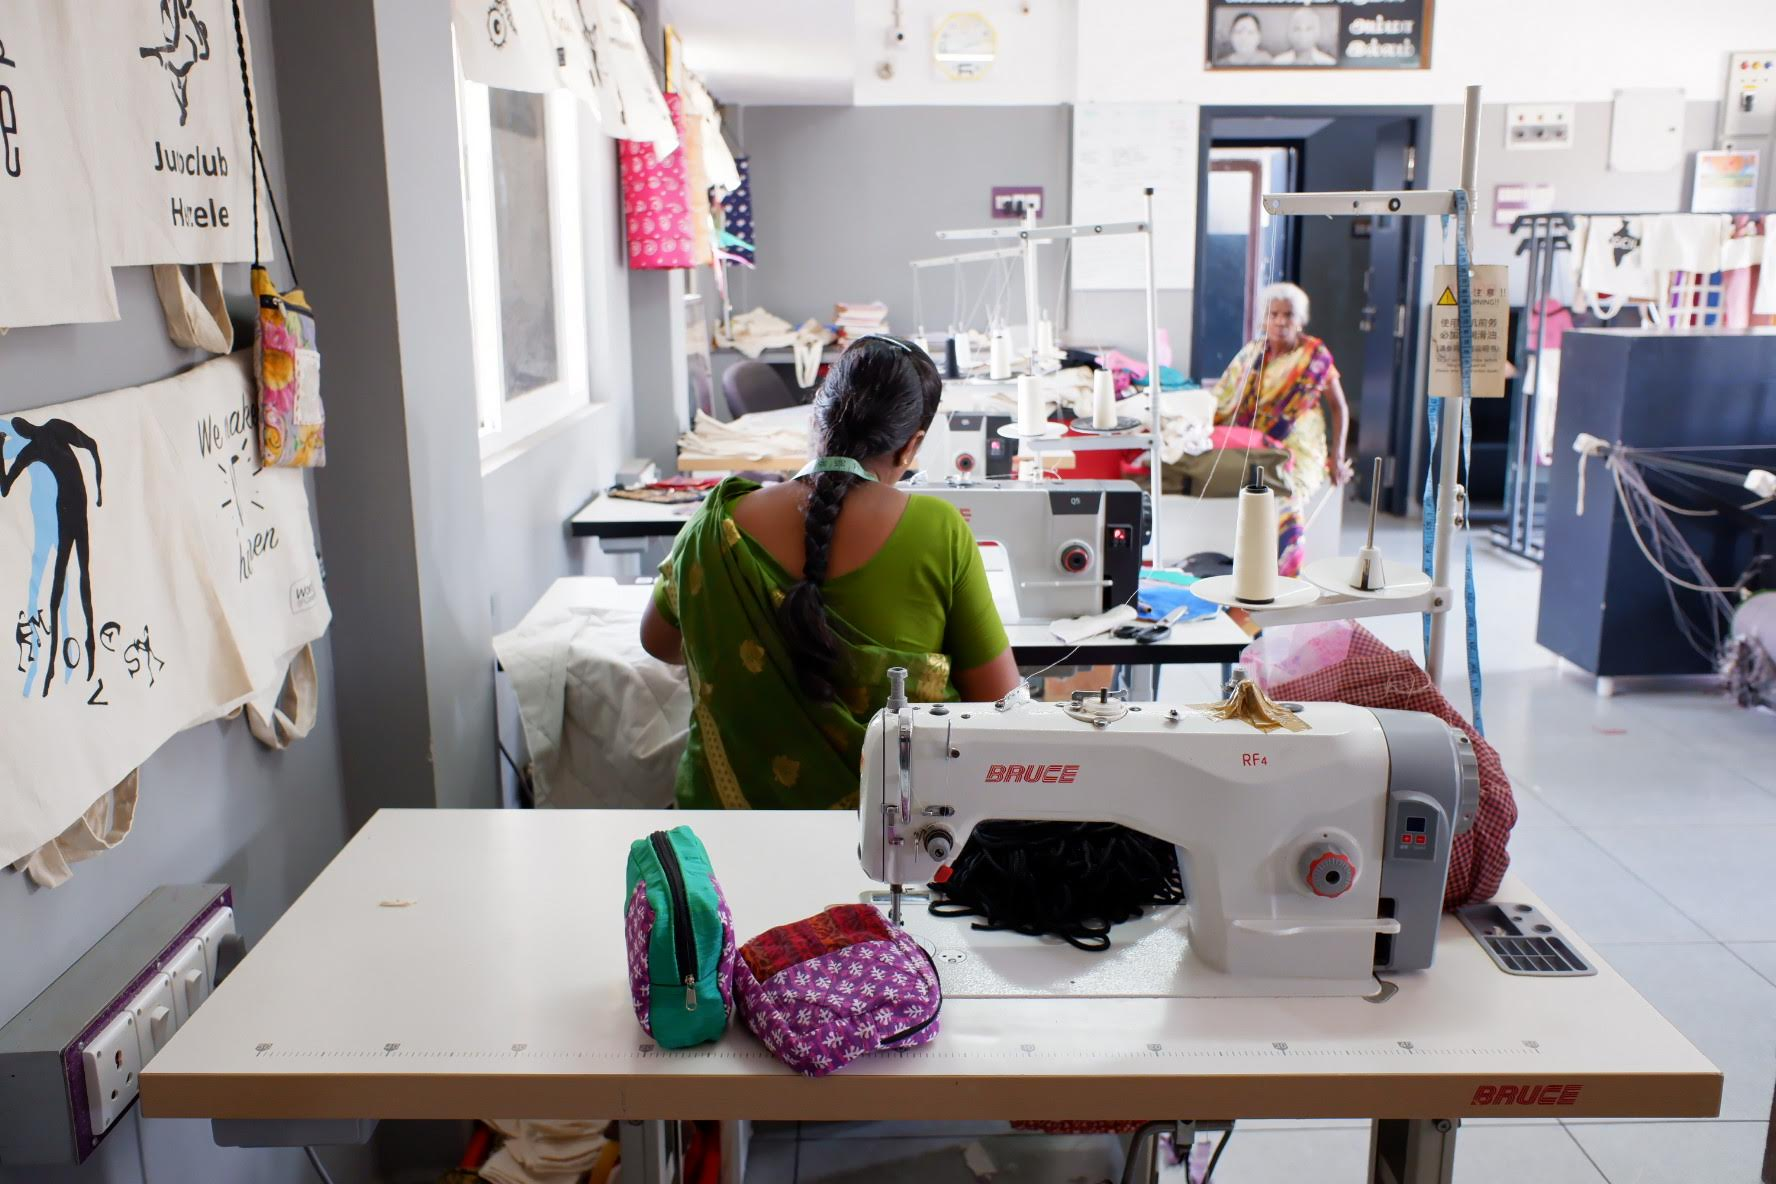 Shaktiism women working in India